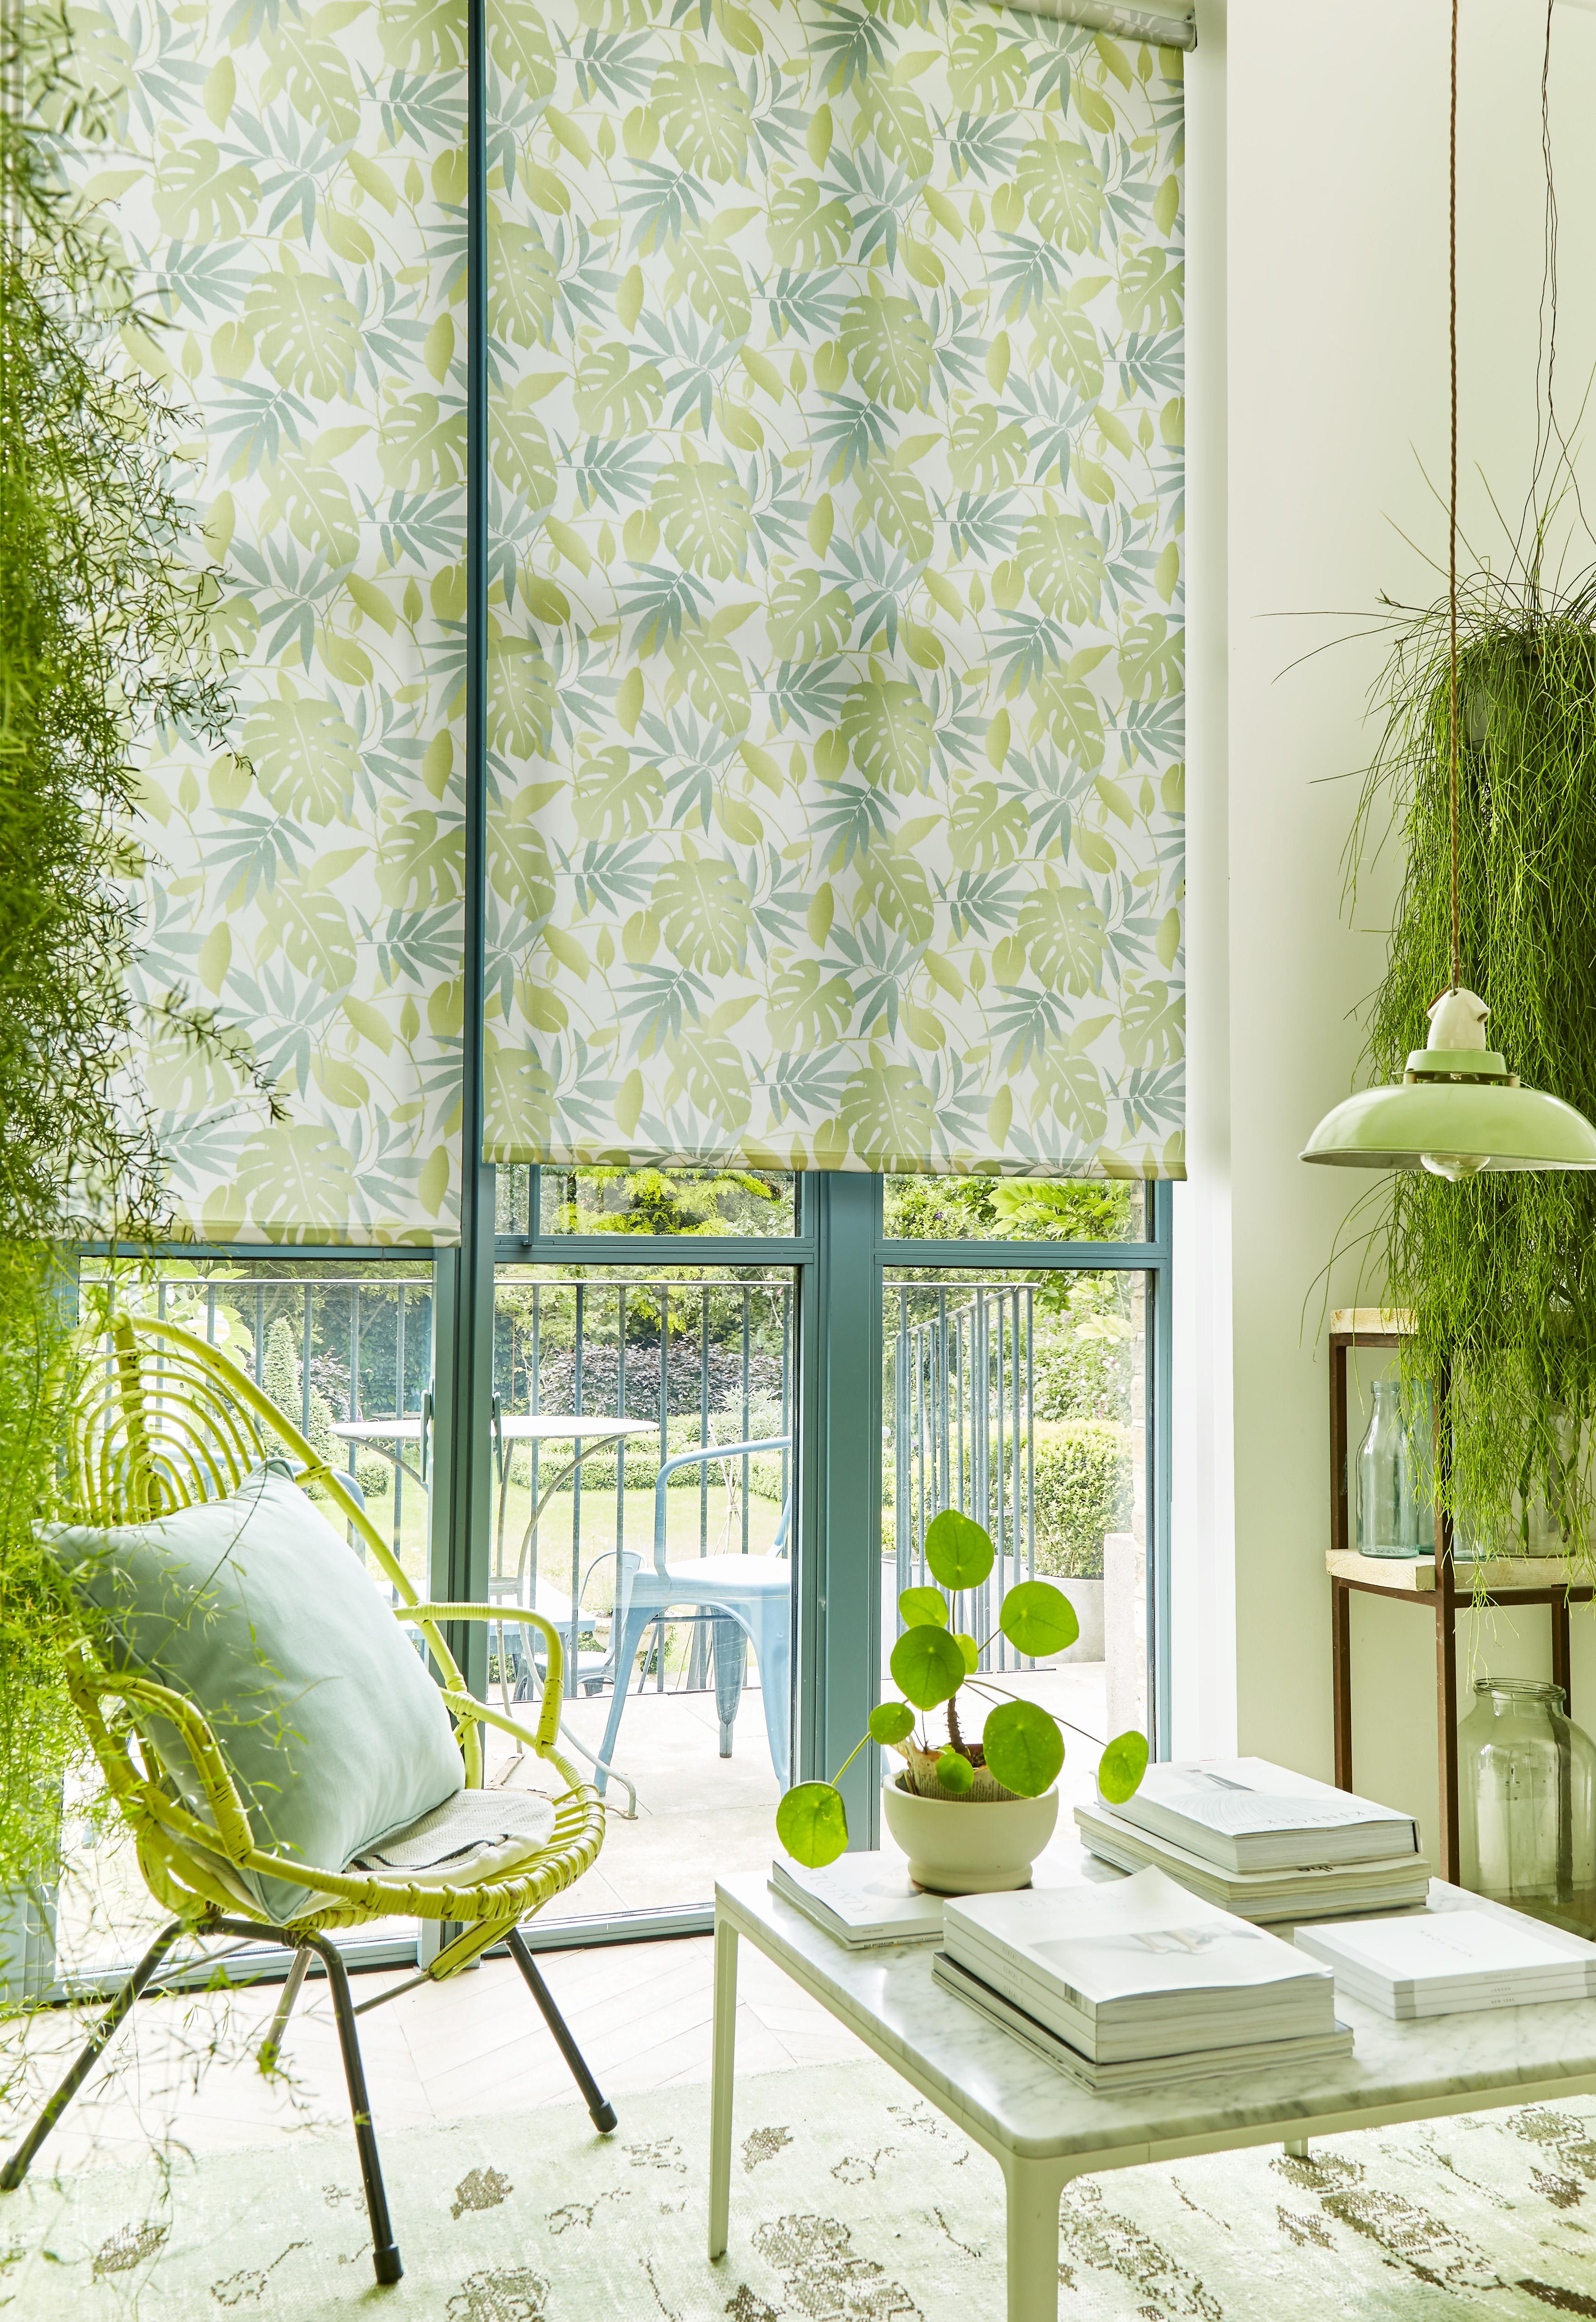 Summer Window Dressing Ideas - Allegro Blinds